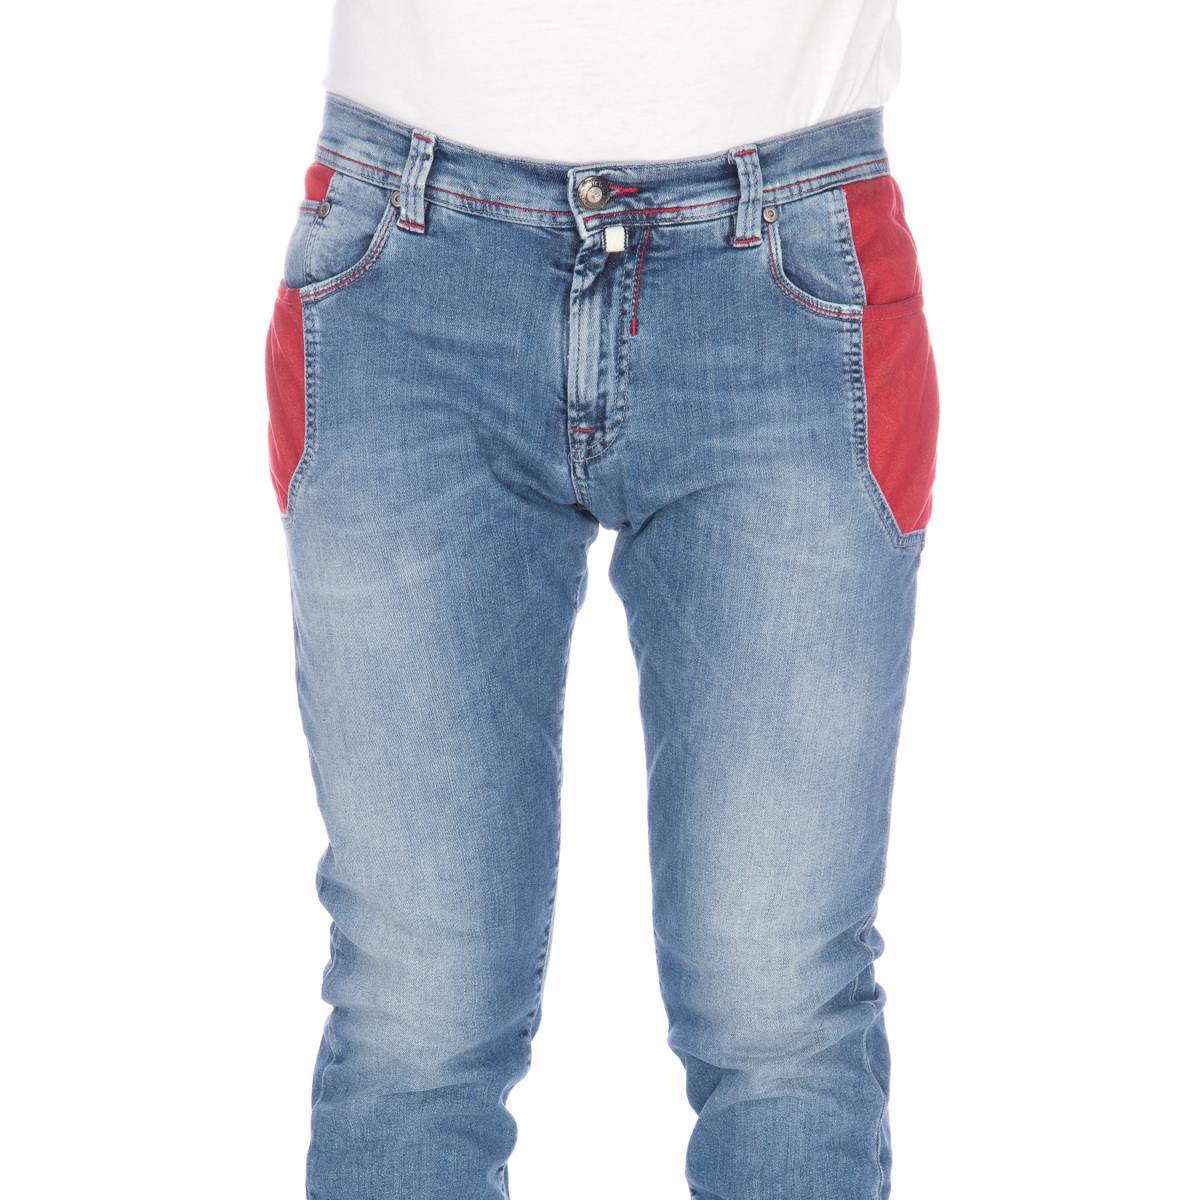 Nicwave PANTALONES - Pantalones smCjuU